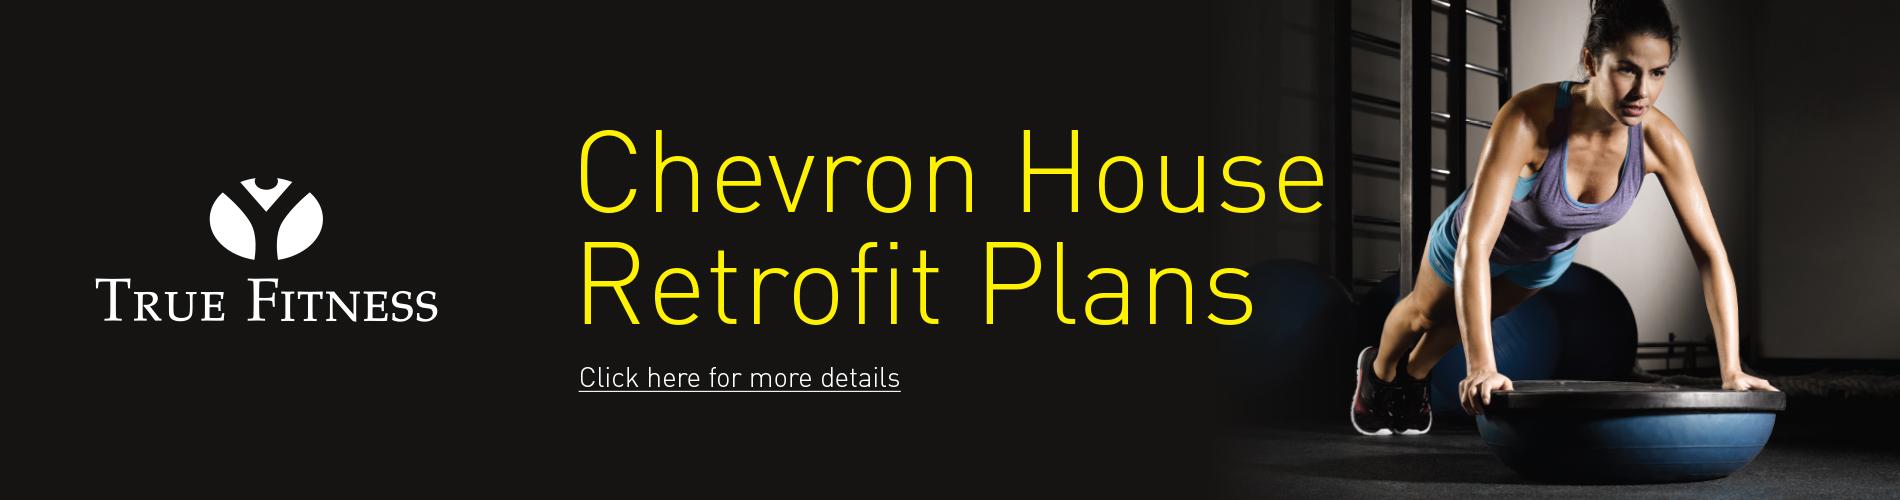 Chevron House Retrofit